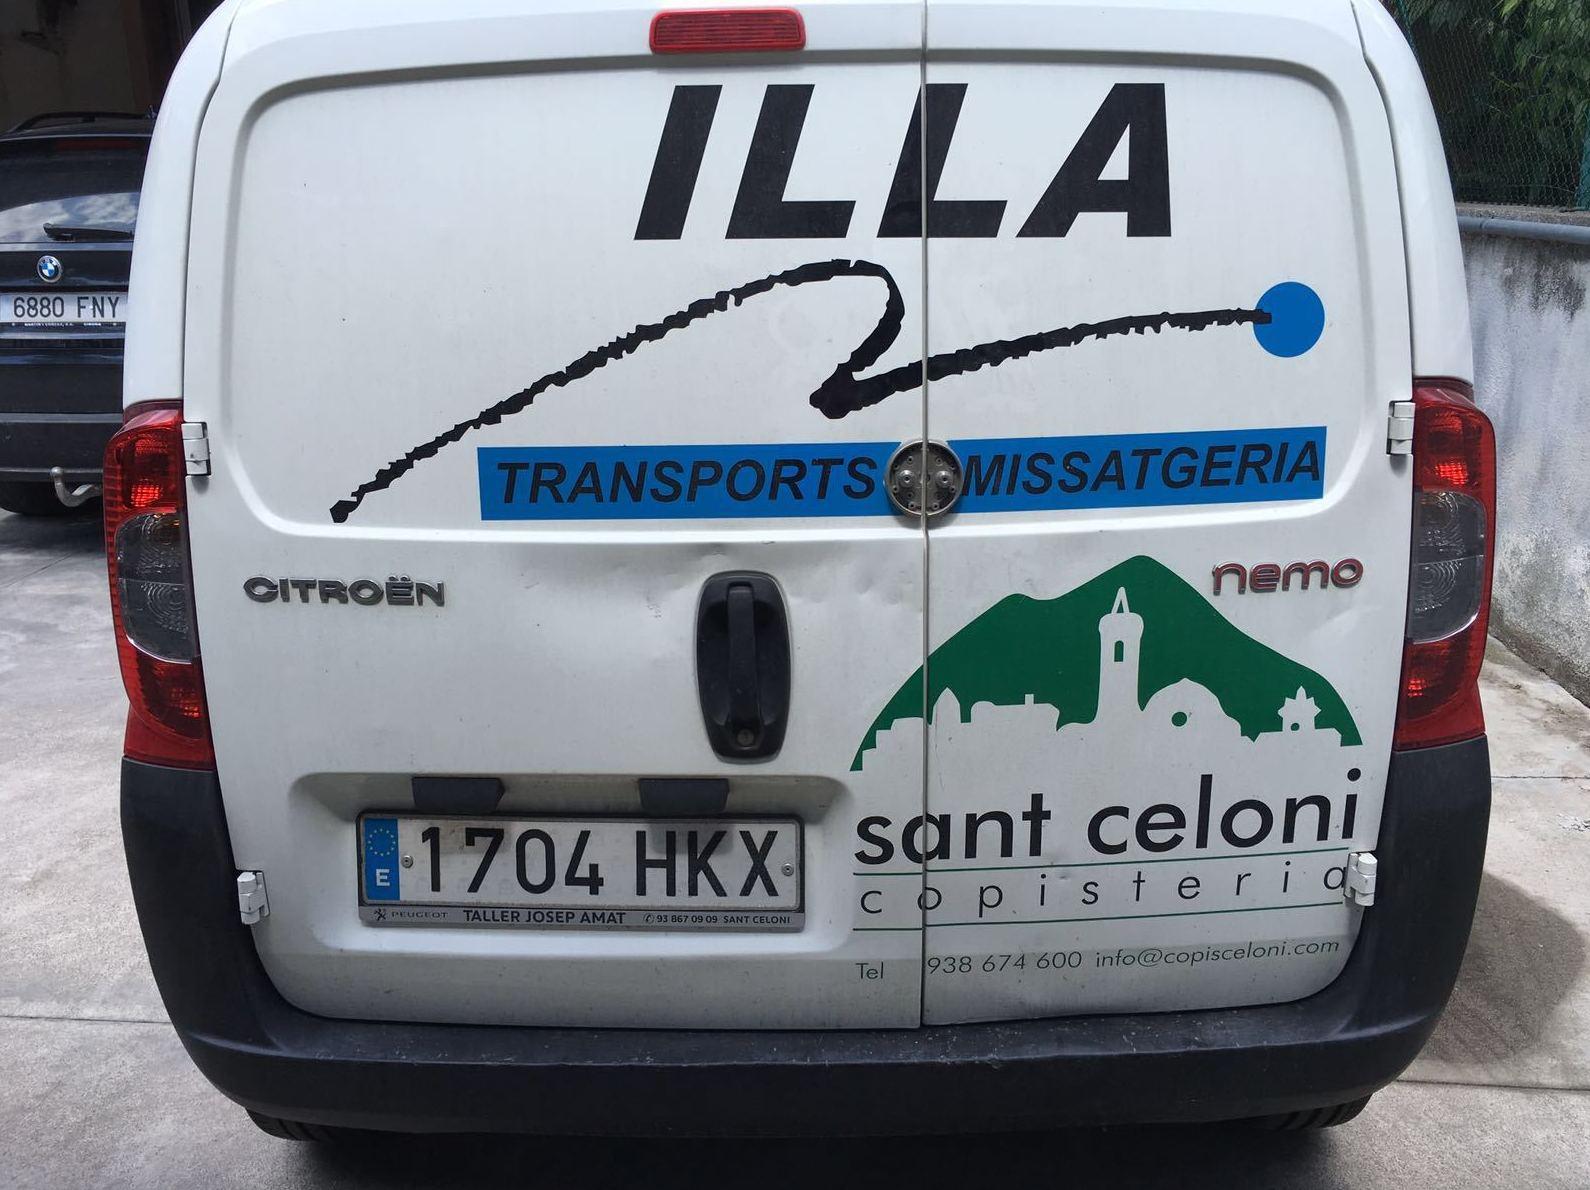 Foto 28 de Mensajería en Sant Celoni | Illa Transports